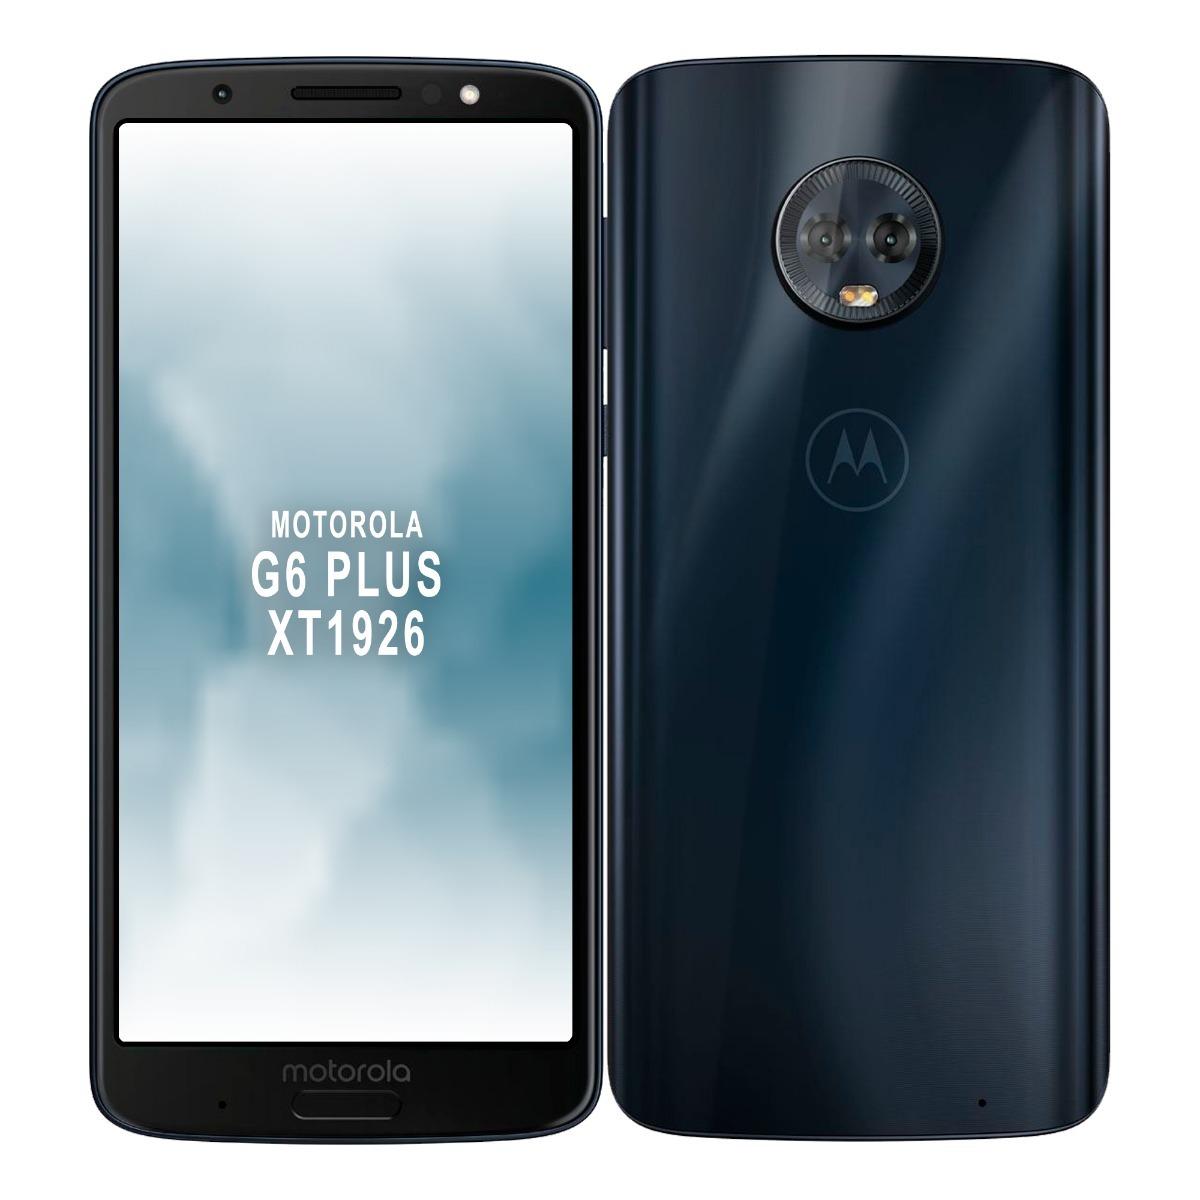 de91fa27c55 Celular Motorola Moto G6 Plus 4gb Ram 64gb Segurcell - U$S 629,00 en  Mercado Libre